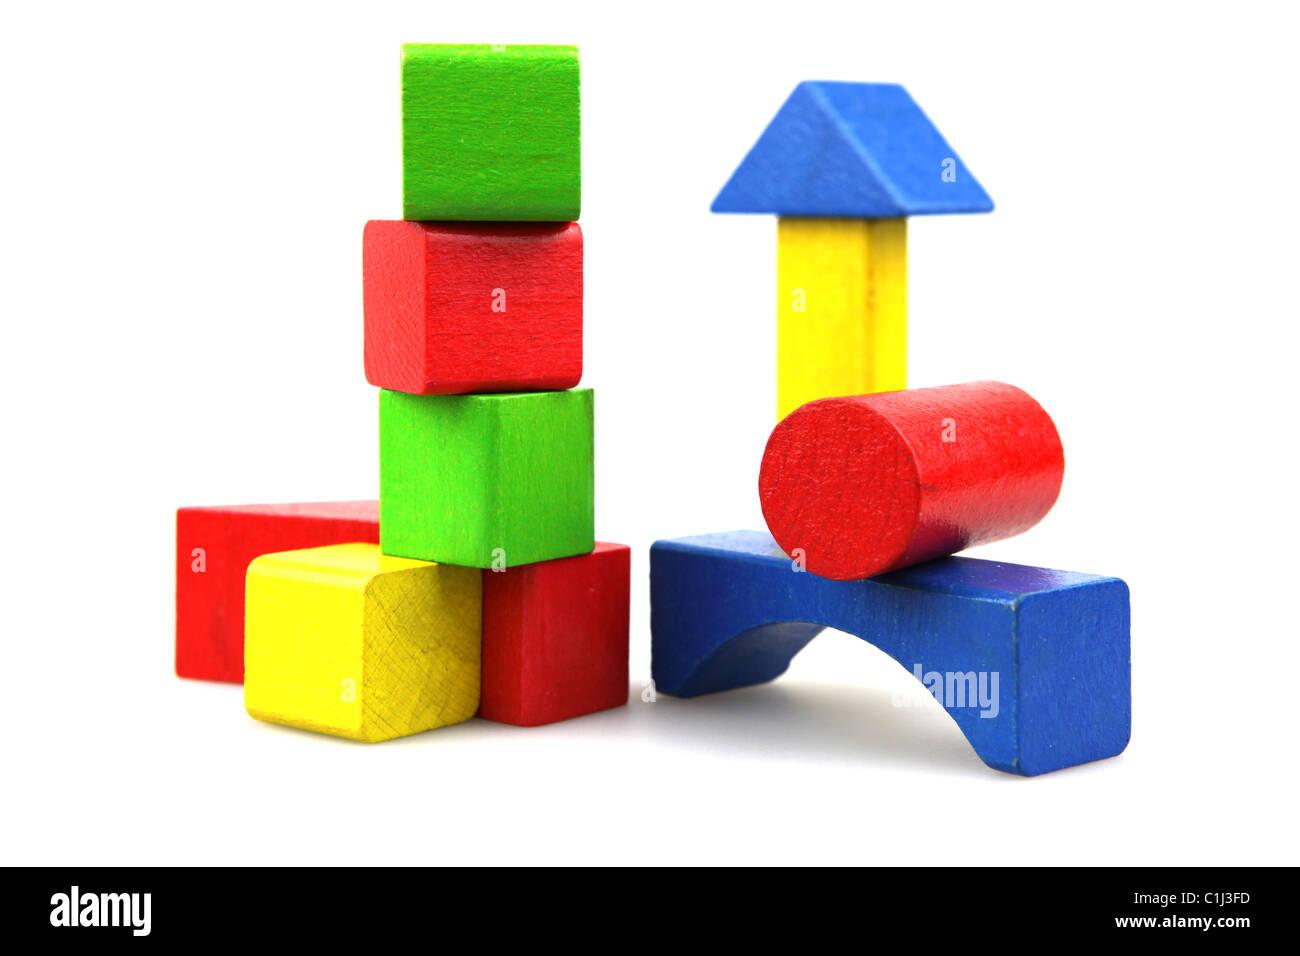 Wooden building blocks - Stock Image